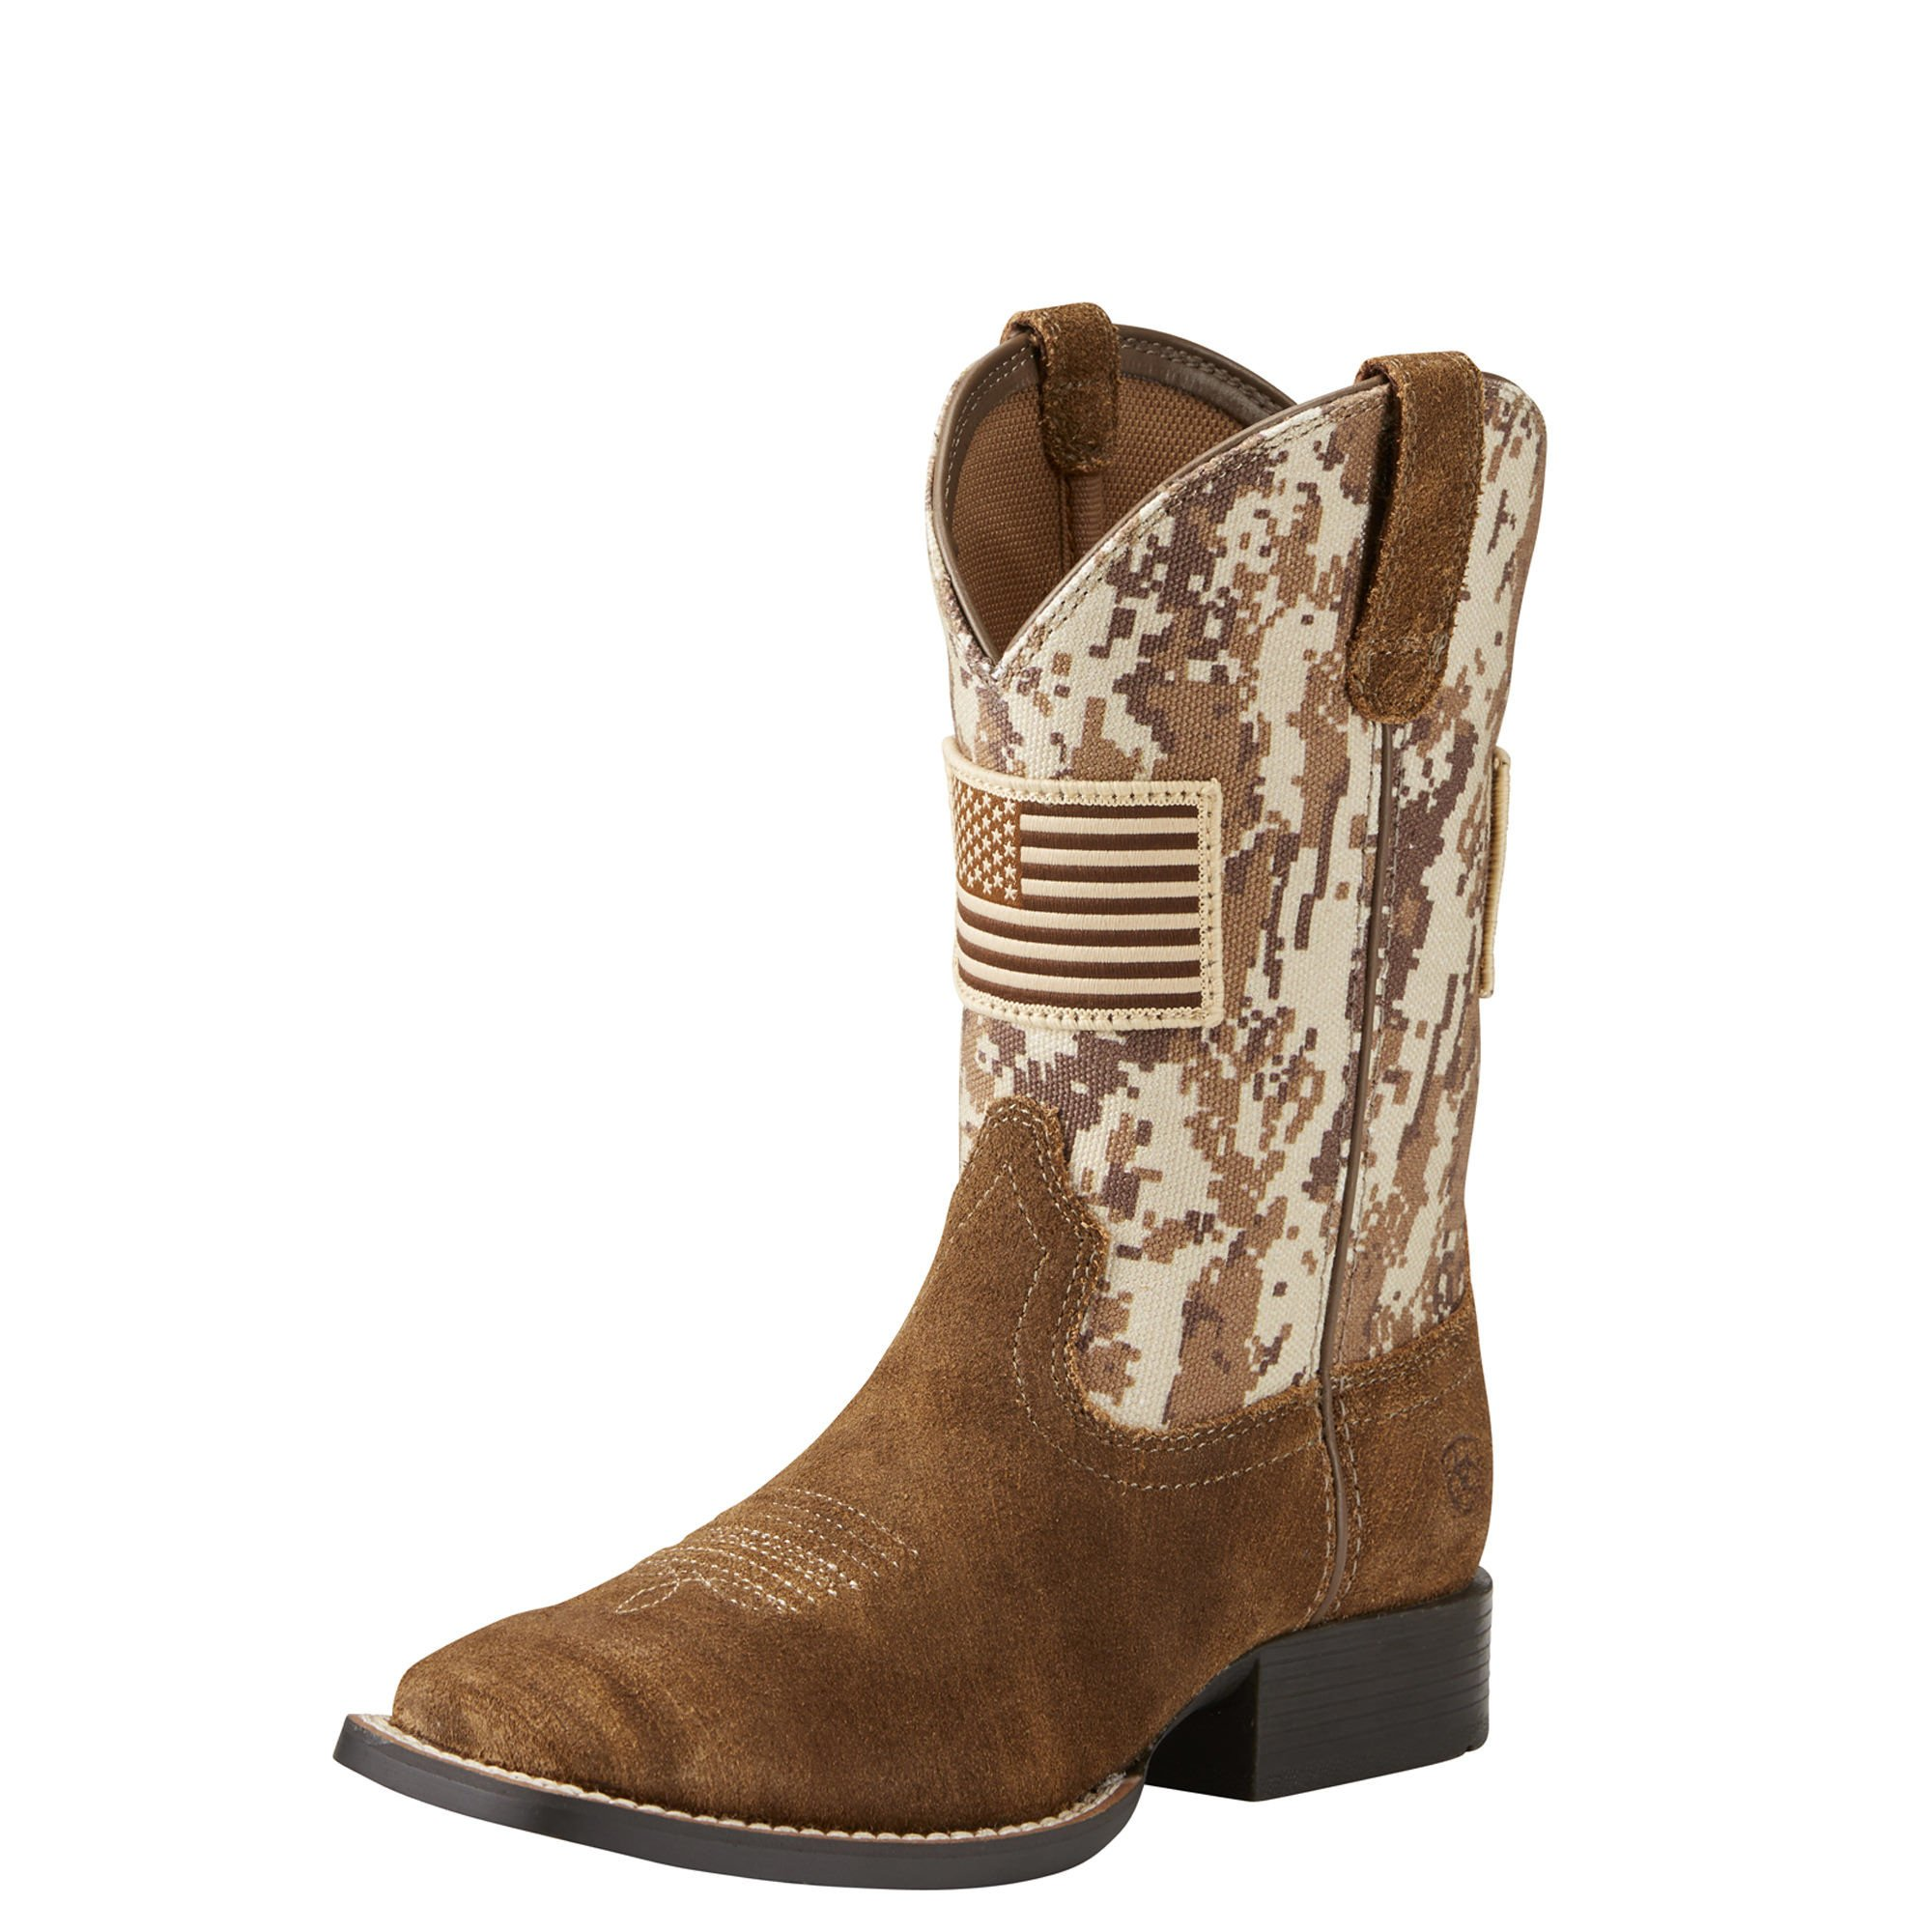 Kids' Patriot Western Cowboy Boot, Antique Mocha Washed Suede, 5 M US Big Kid